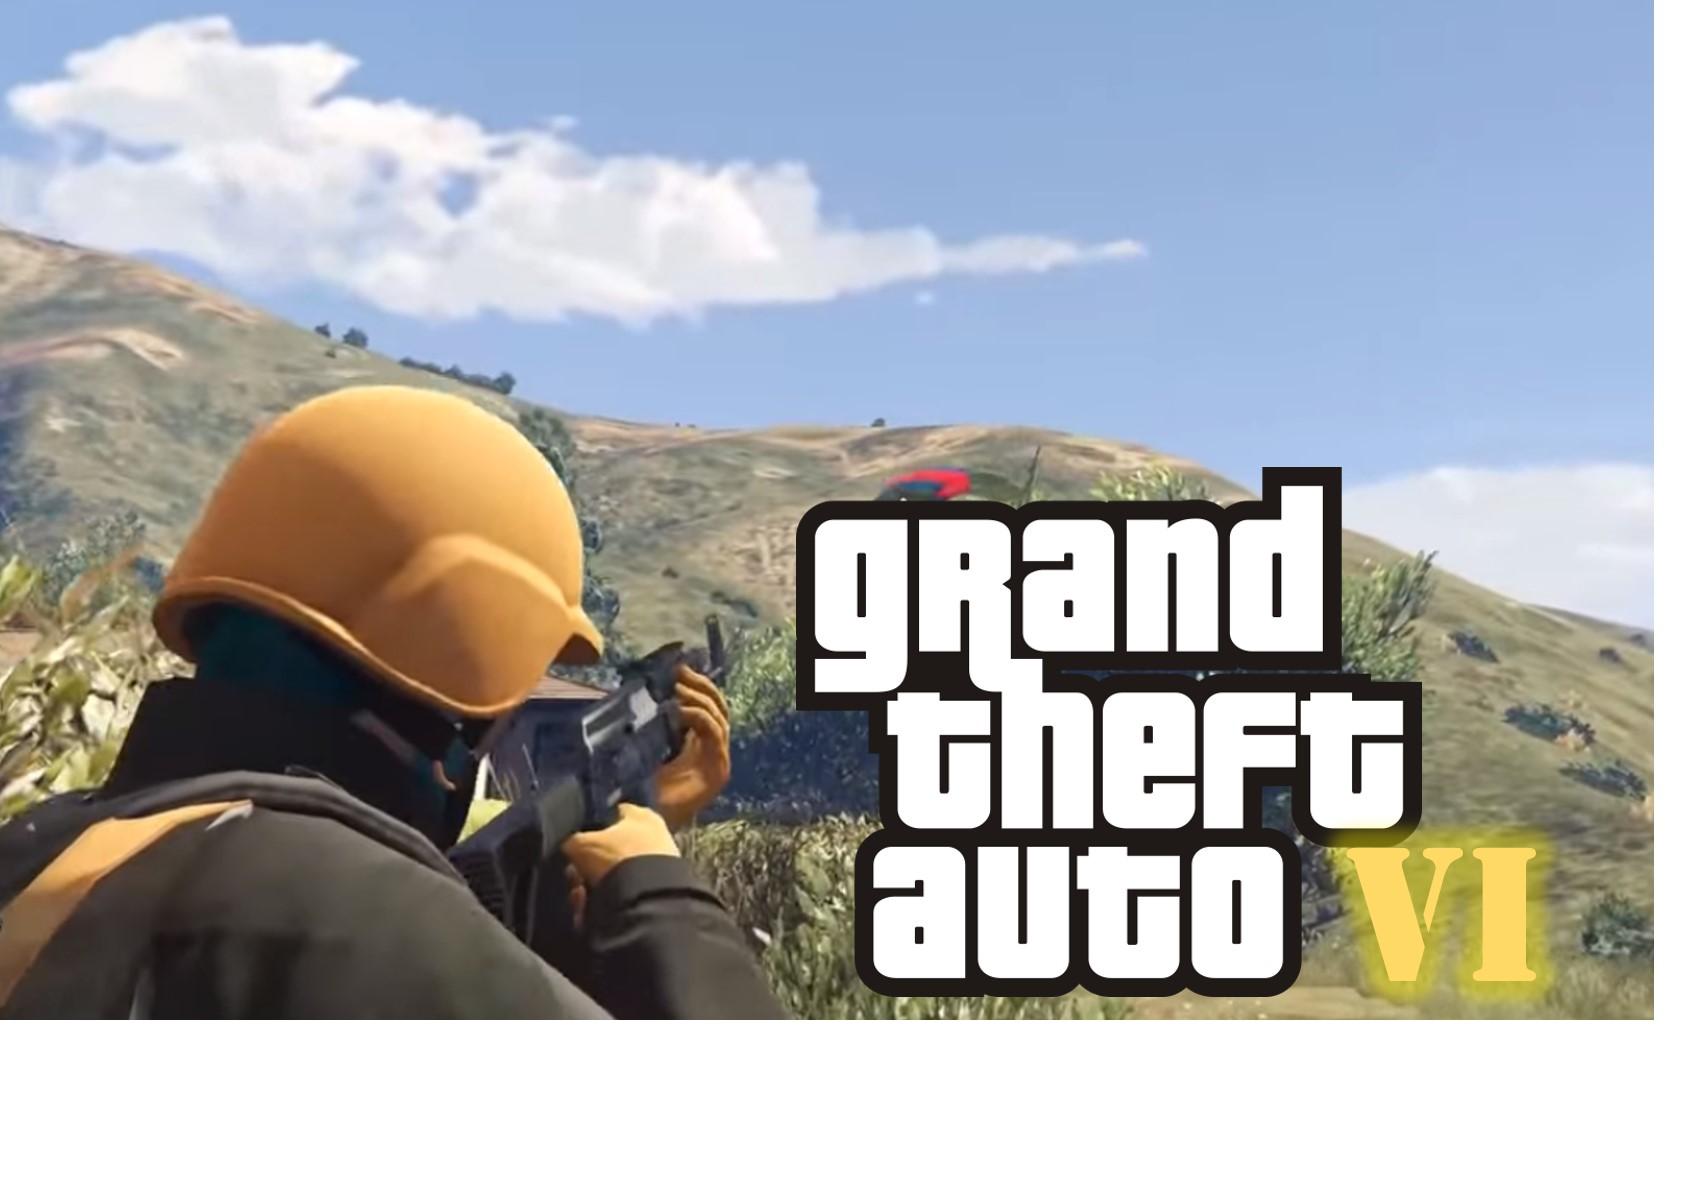 GTA VI release date